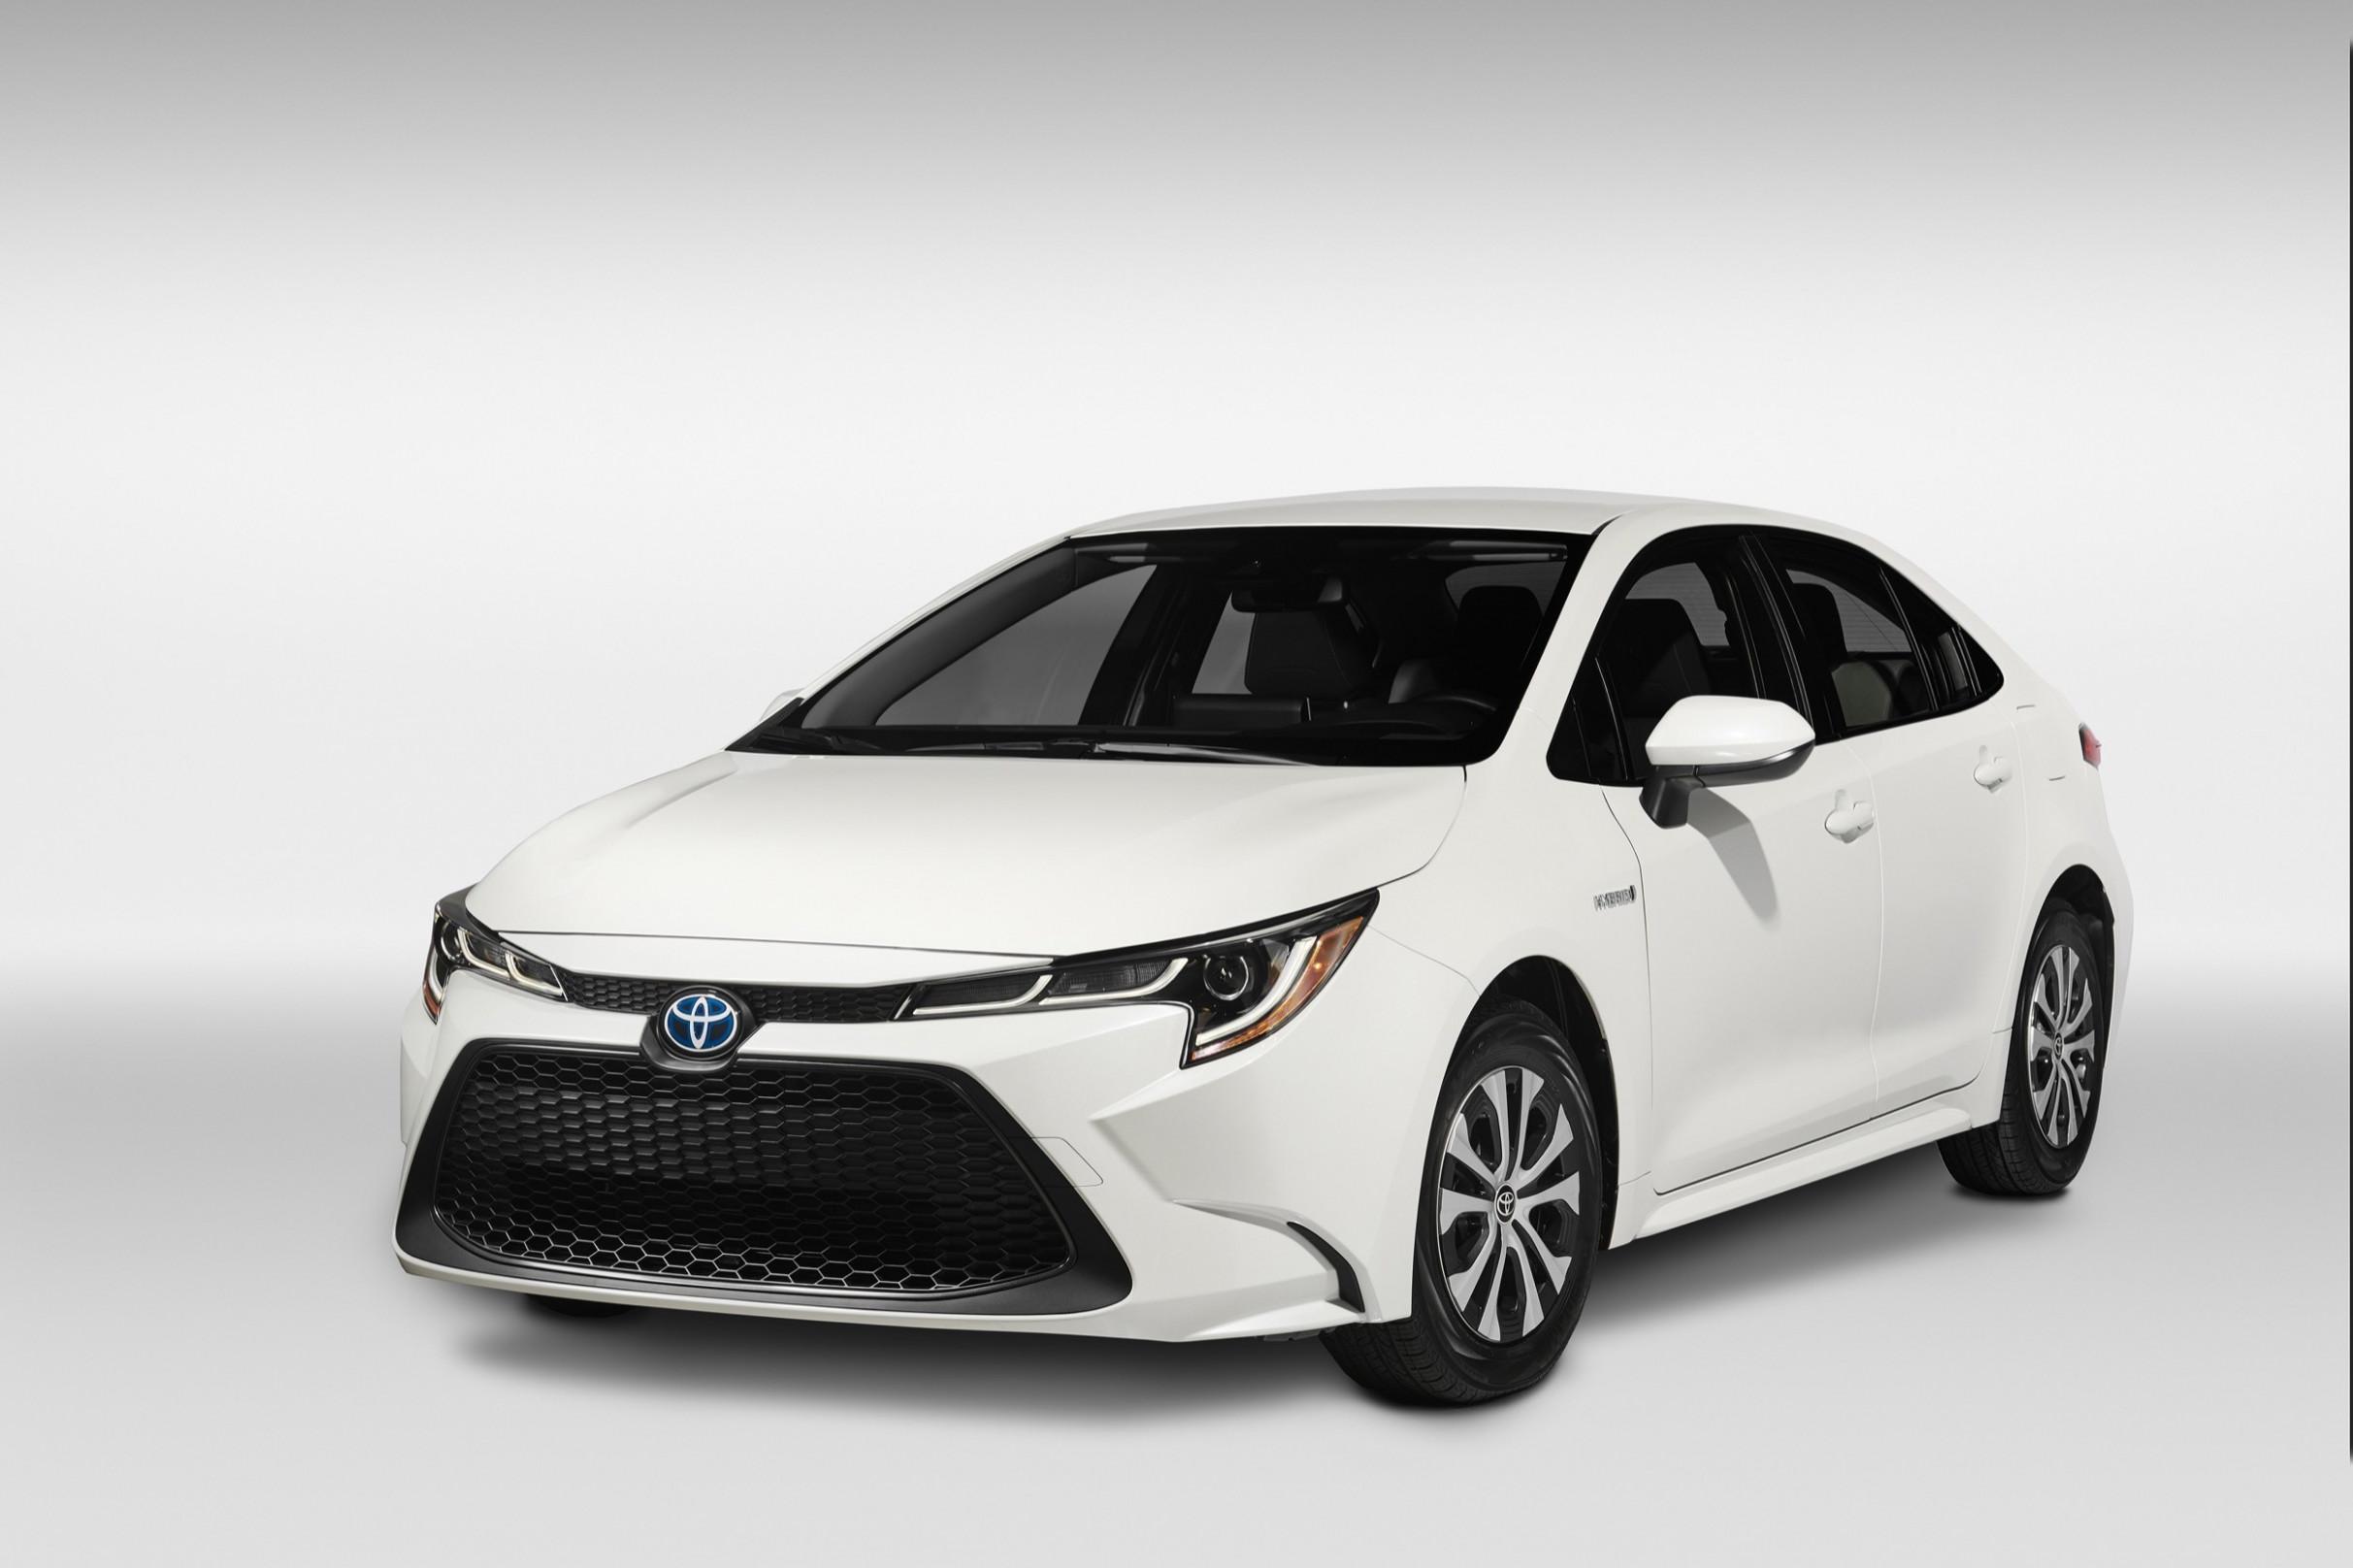 Exterior 2022 Toyota Altis